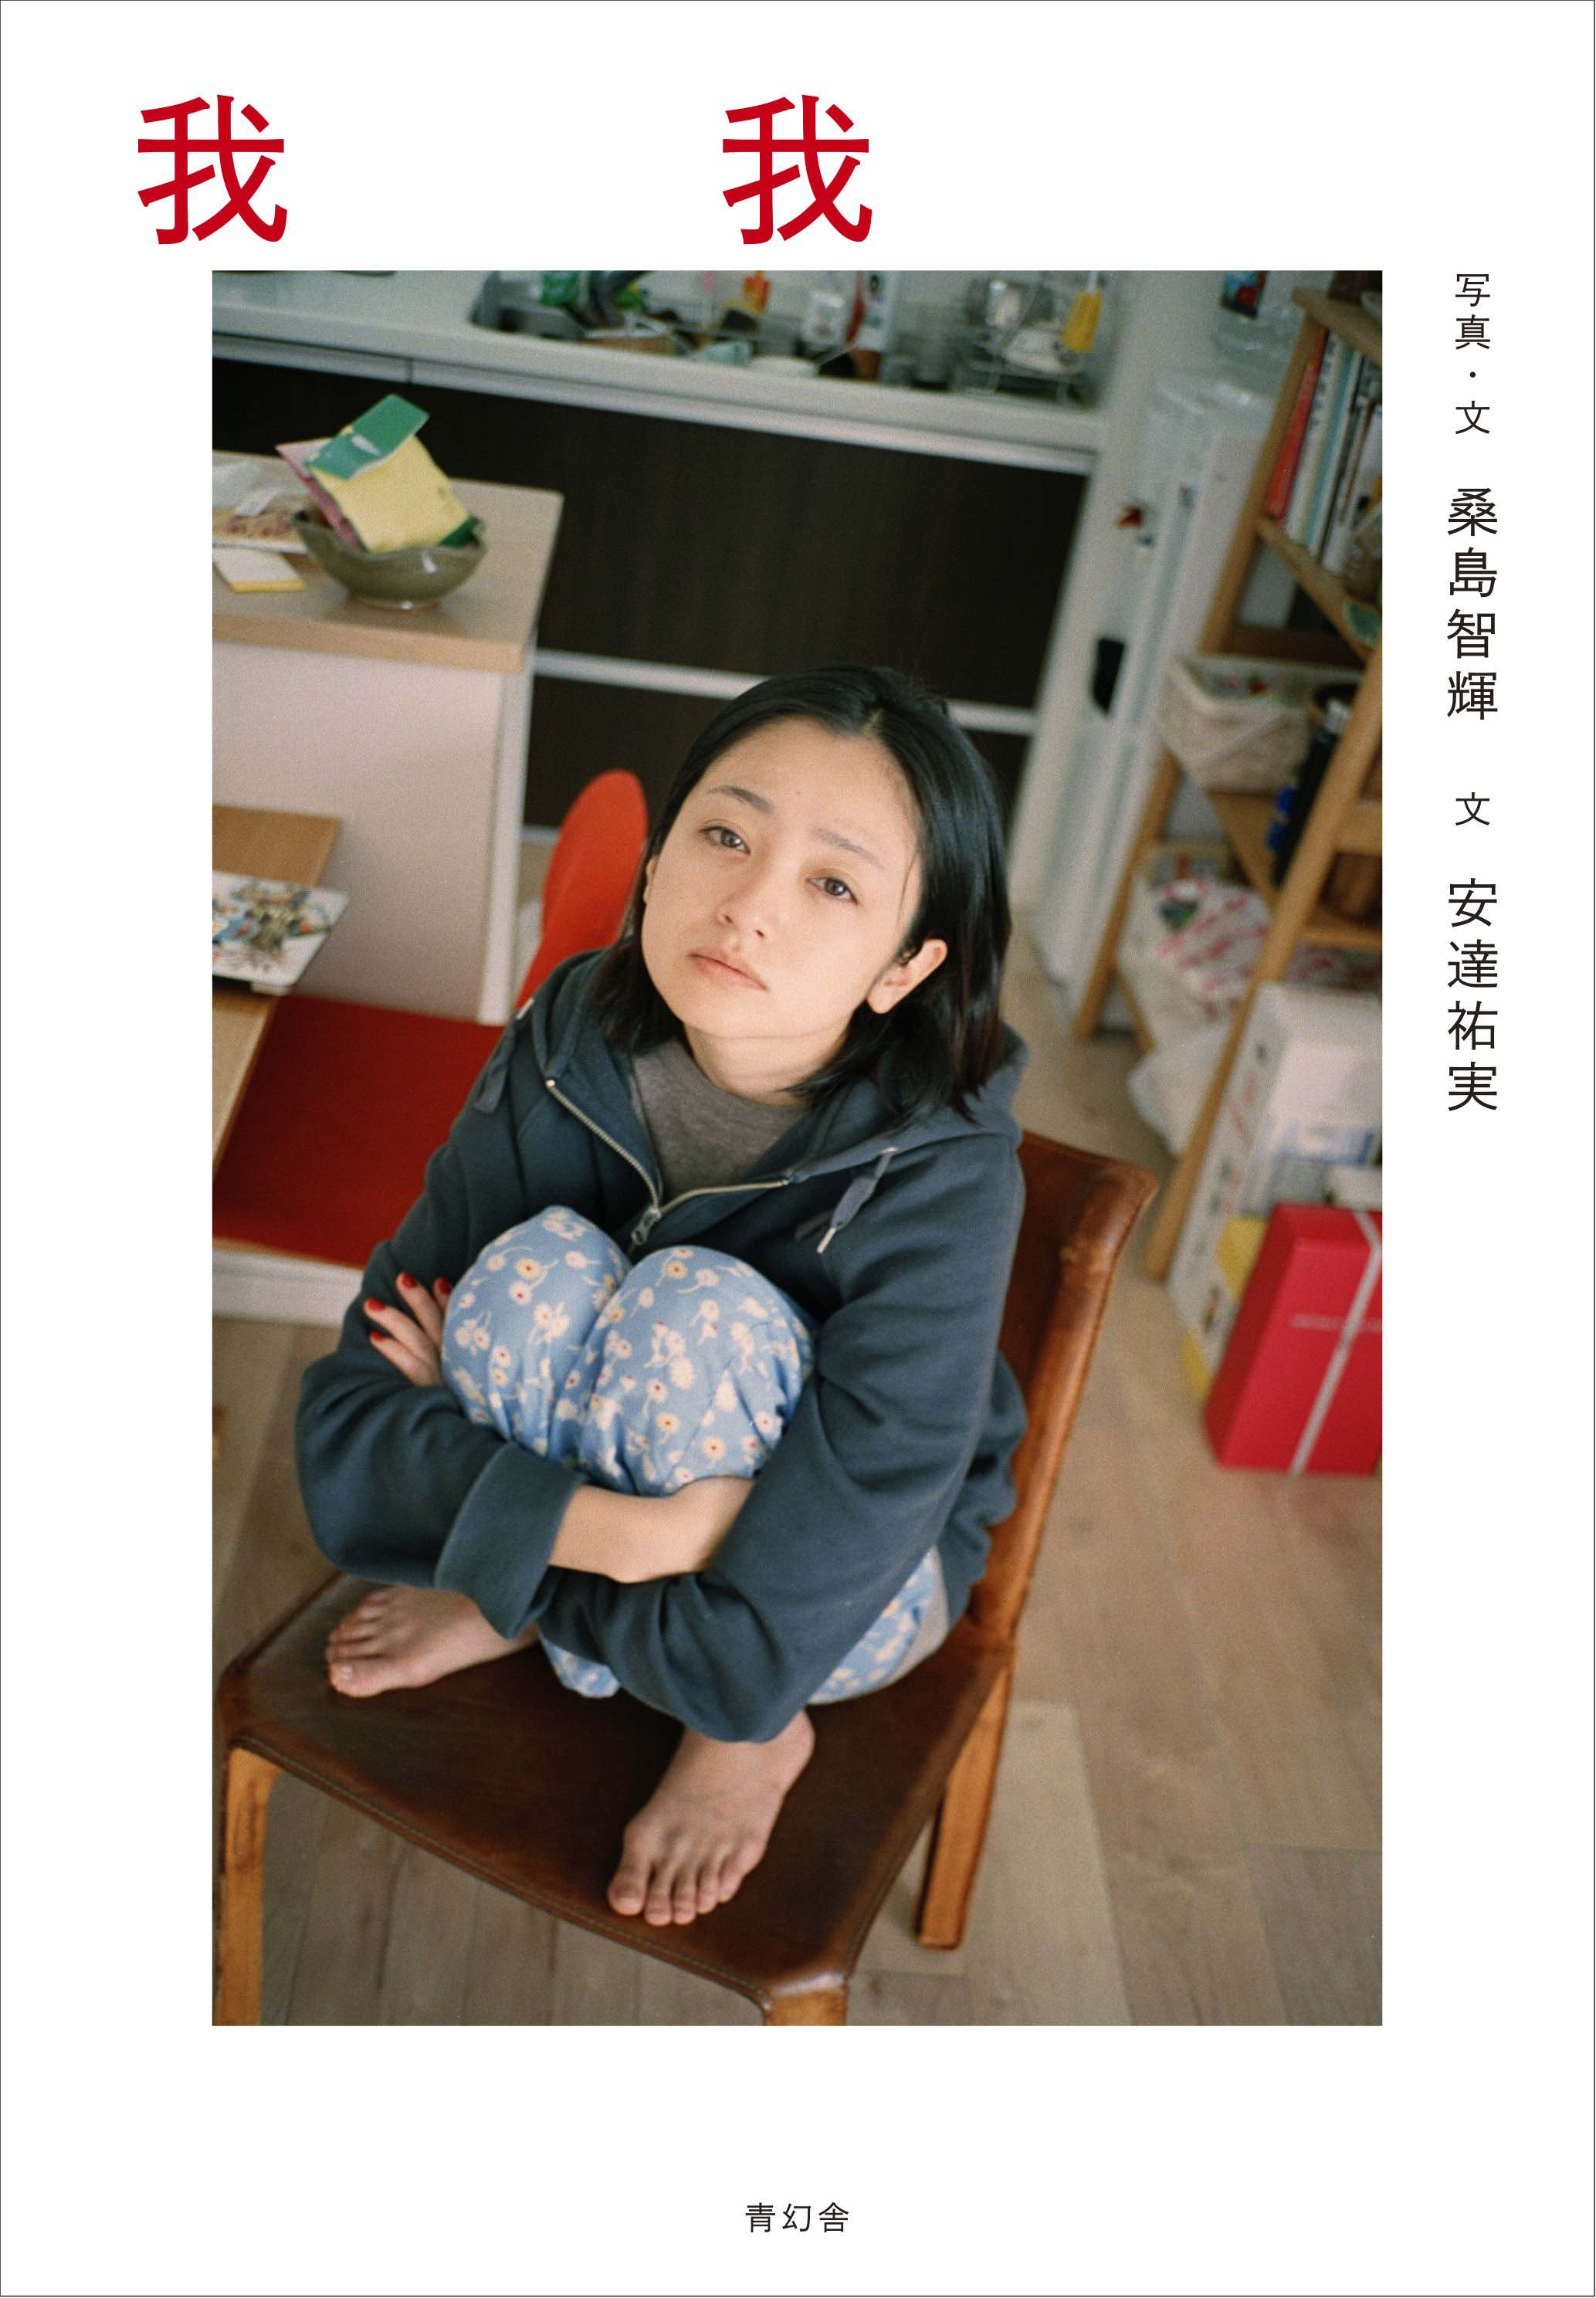 INFORMATION OF YUMI ADACHI & TOMOKI QWAJIMA